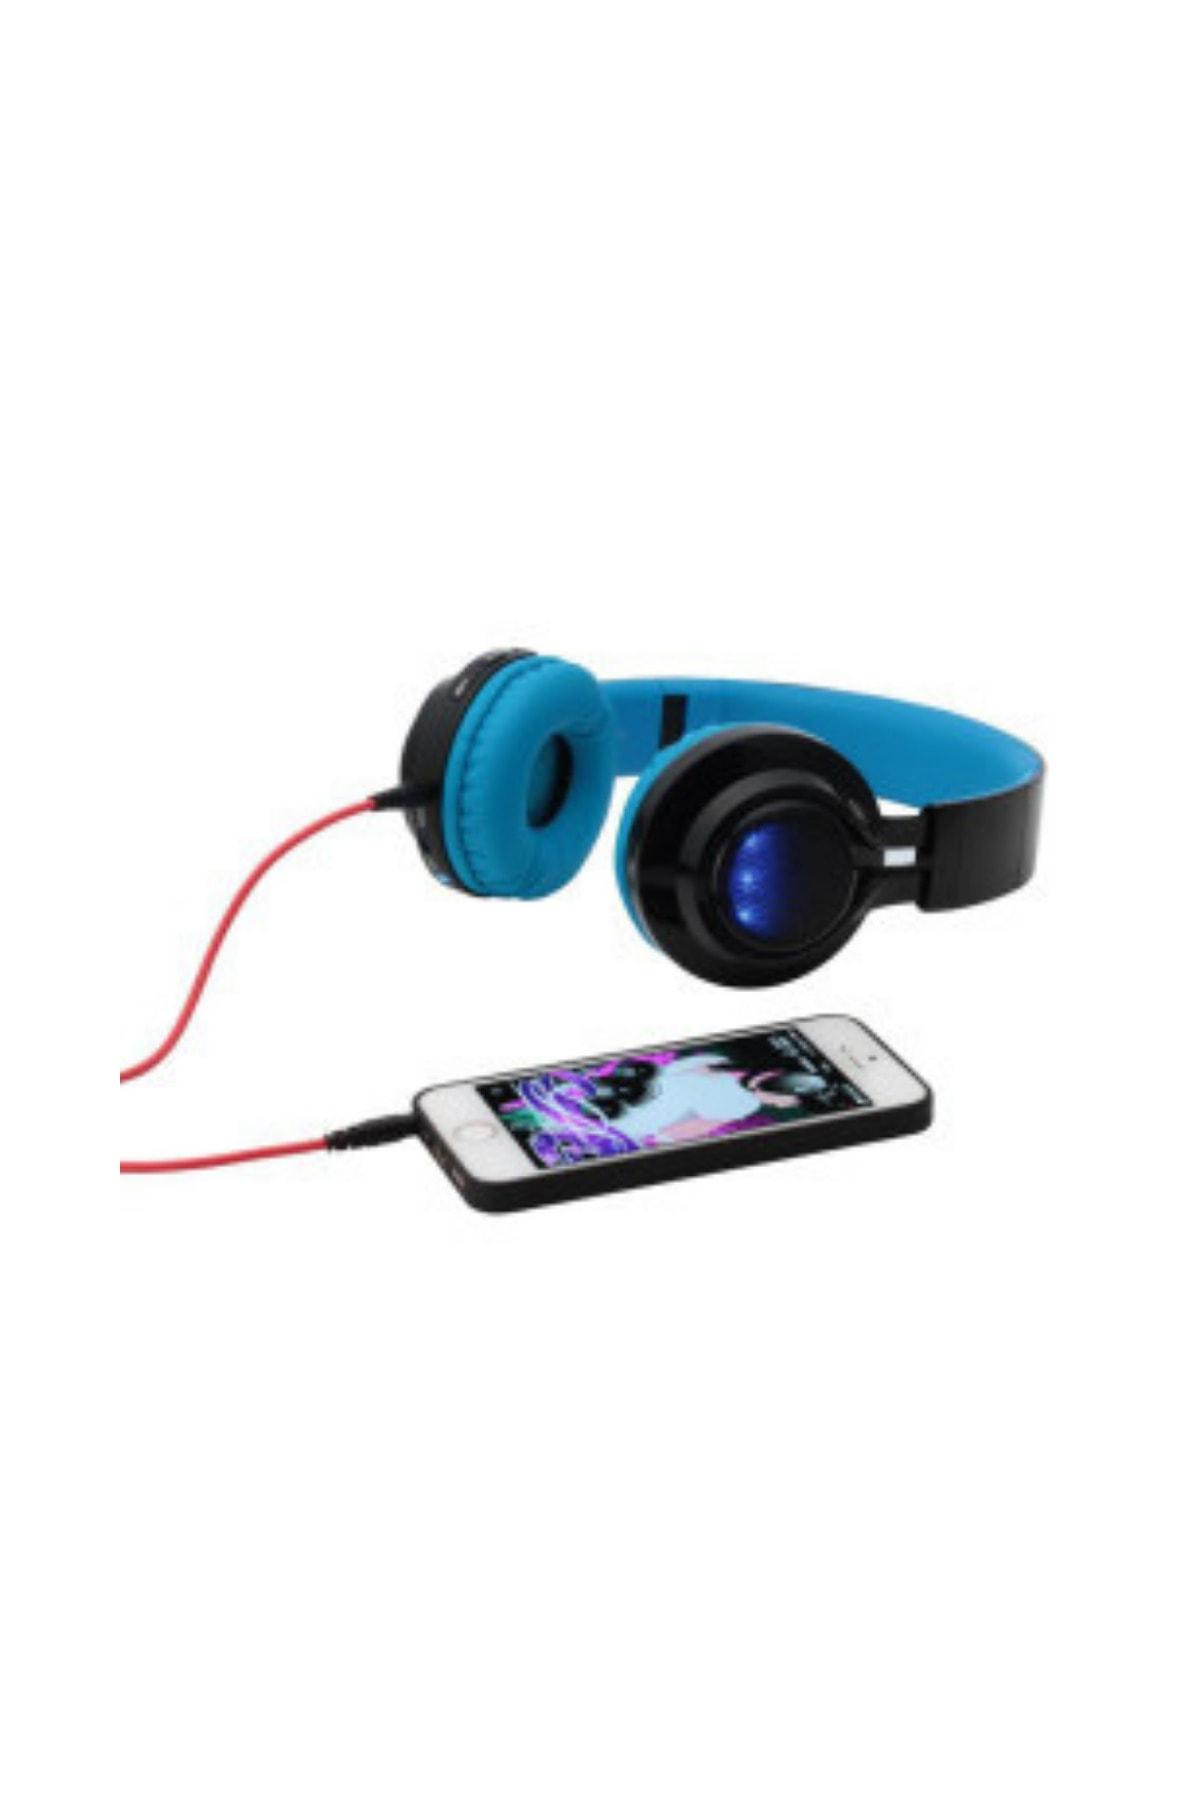 zore Bt-005 Bluetooth Kulaküstü Kablosuz Kulaklık Led Işıklı Sporcu Kulaklık 2